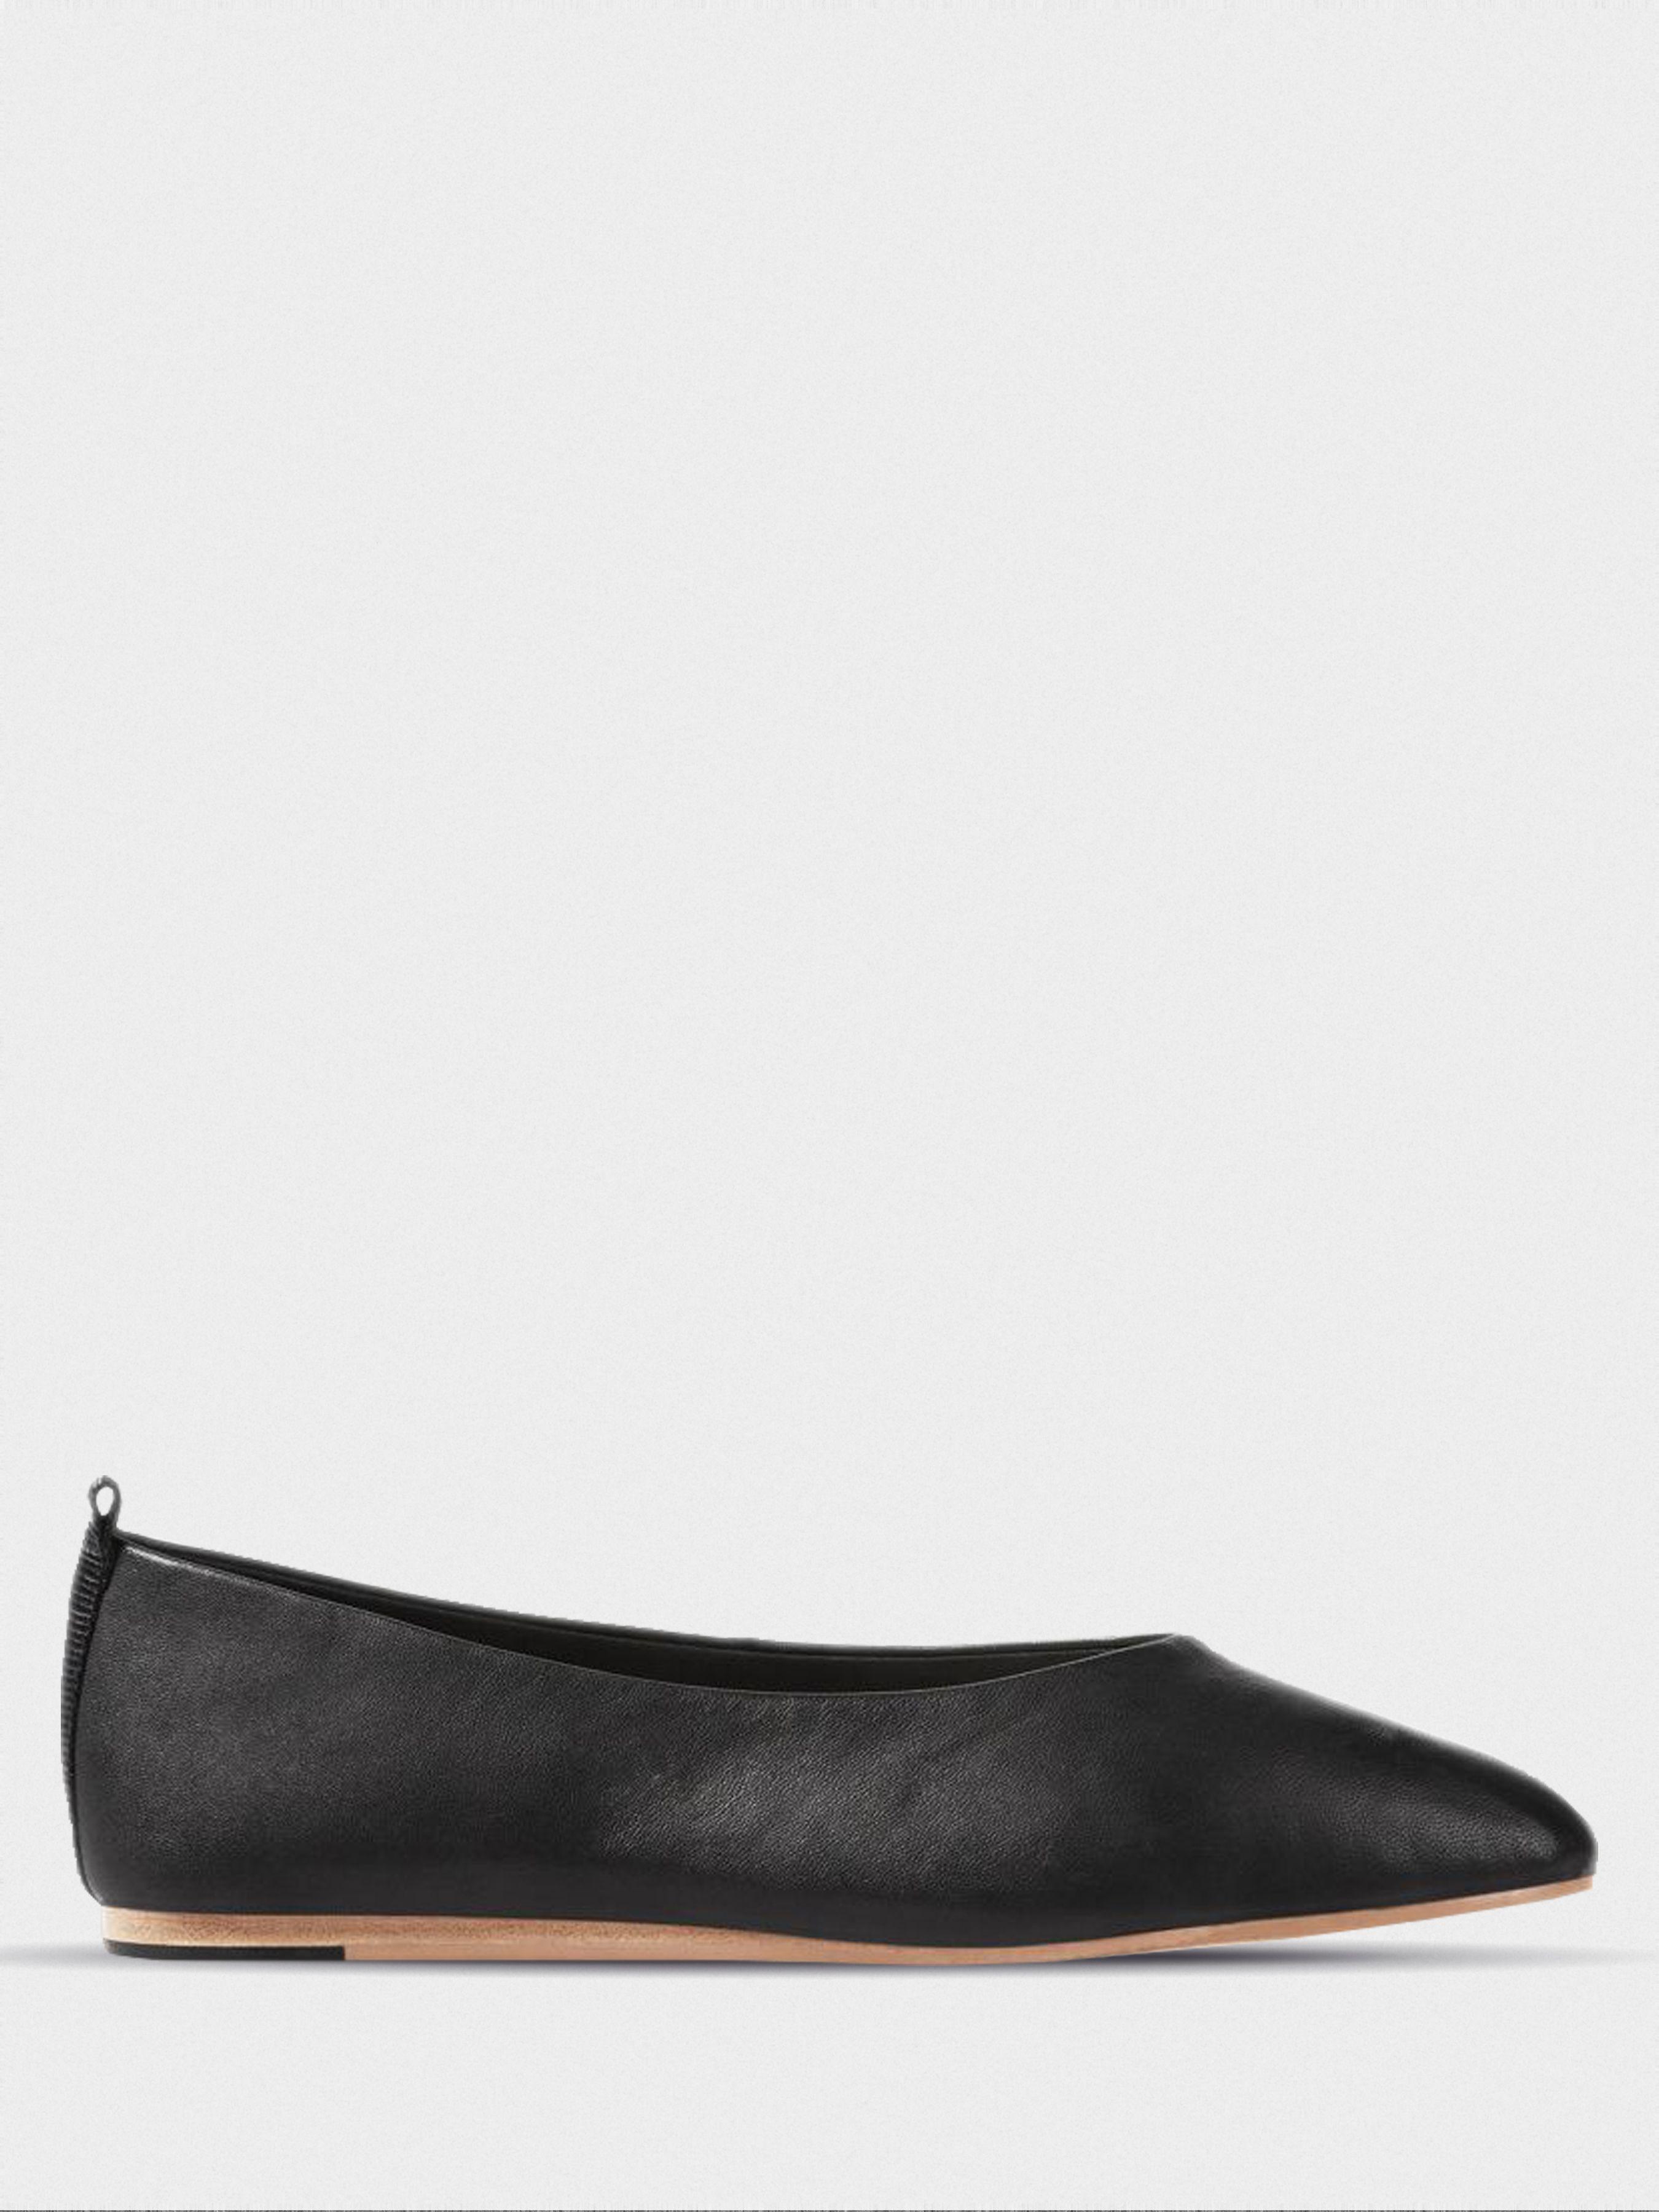 Балетки женские MARC O'POLO PY968 размерная сетка обуви, 2017